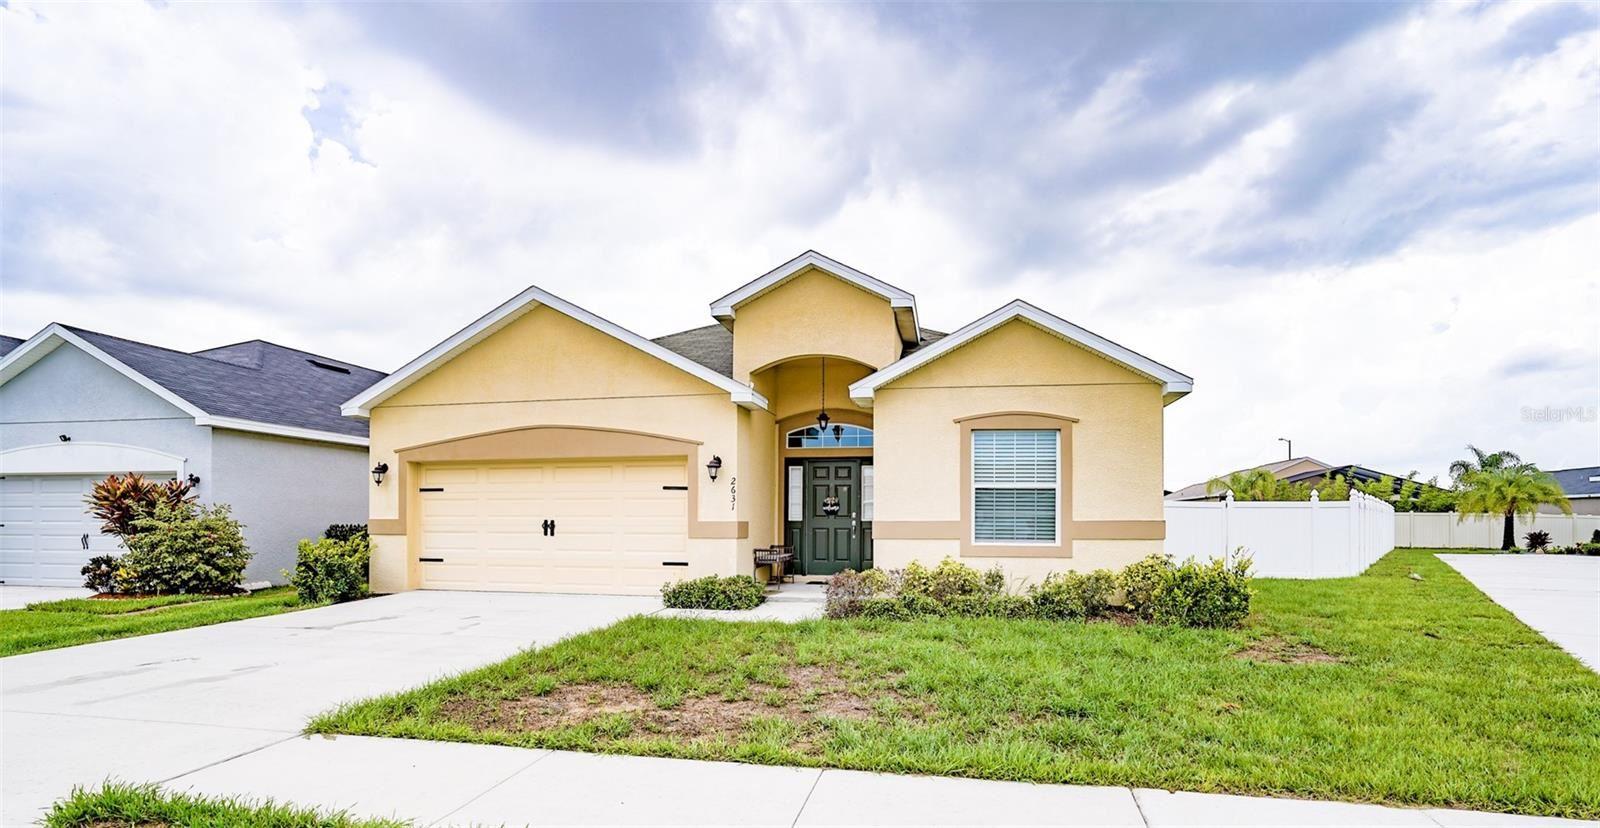 2631 SANDERLING STREET, Haines City, FL 33844 - #: P4916276